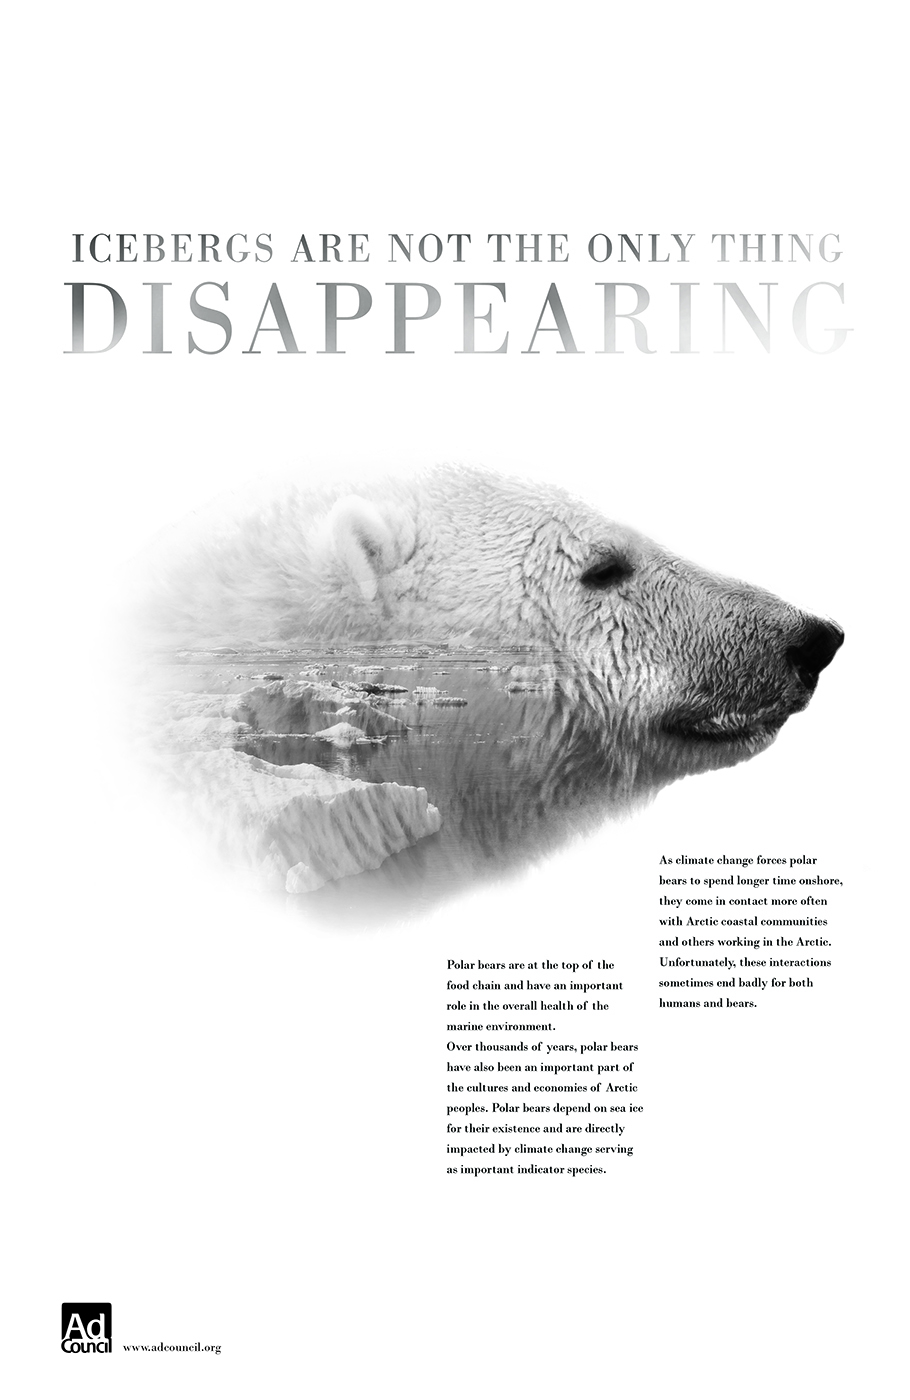 polarbearpro